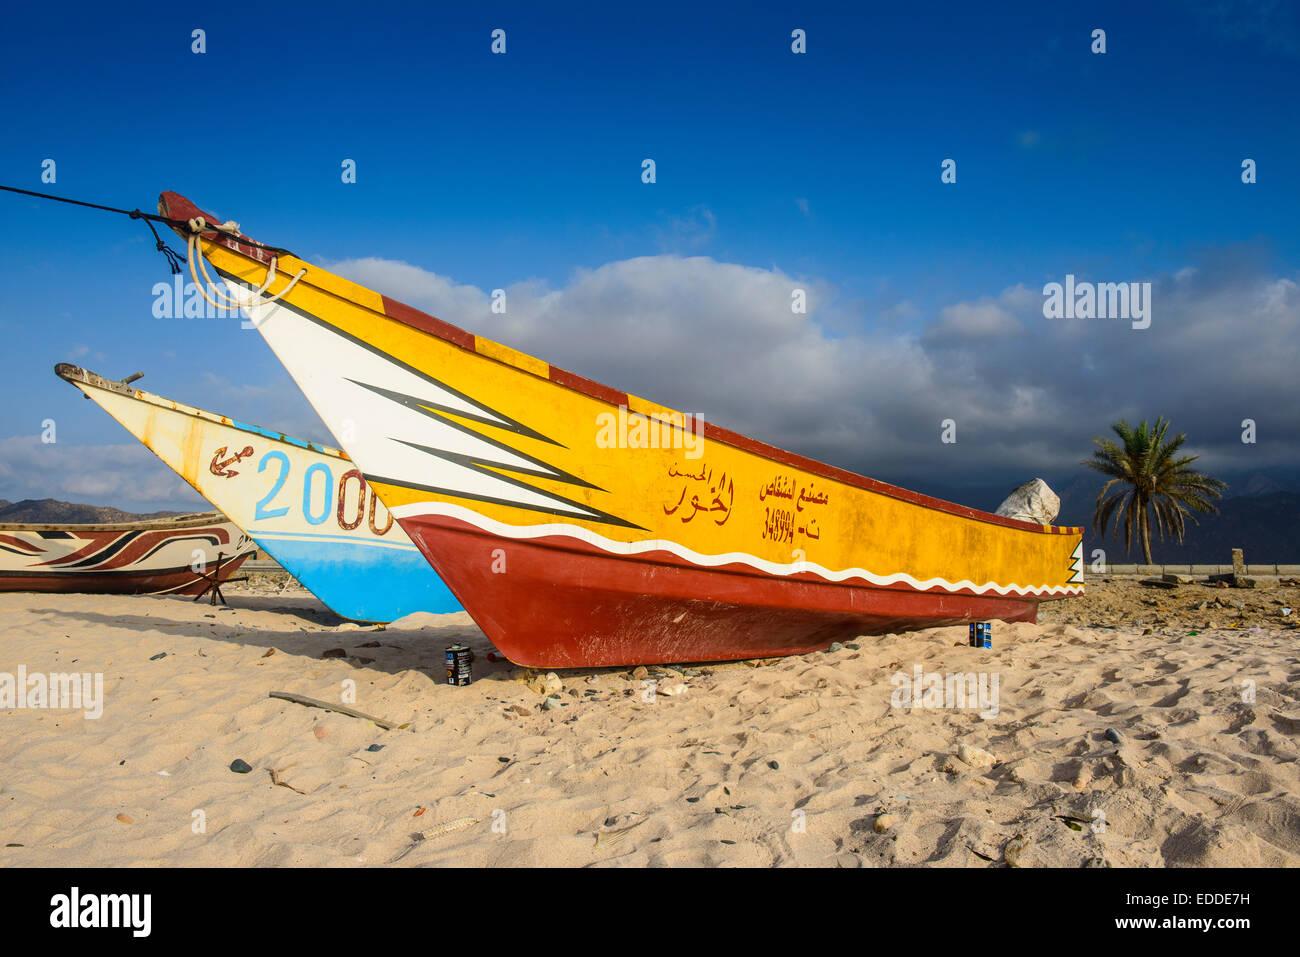 Colourful fishing boats on the beach, Hadibu, island of Socotra, Yemen - Stock Image